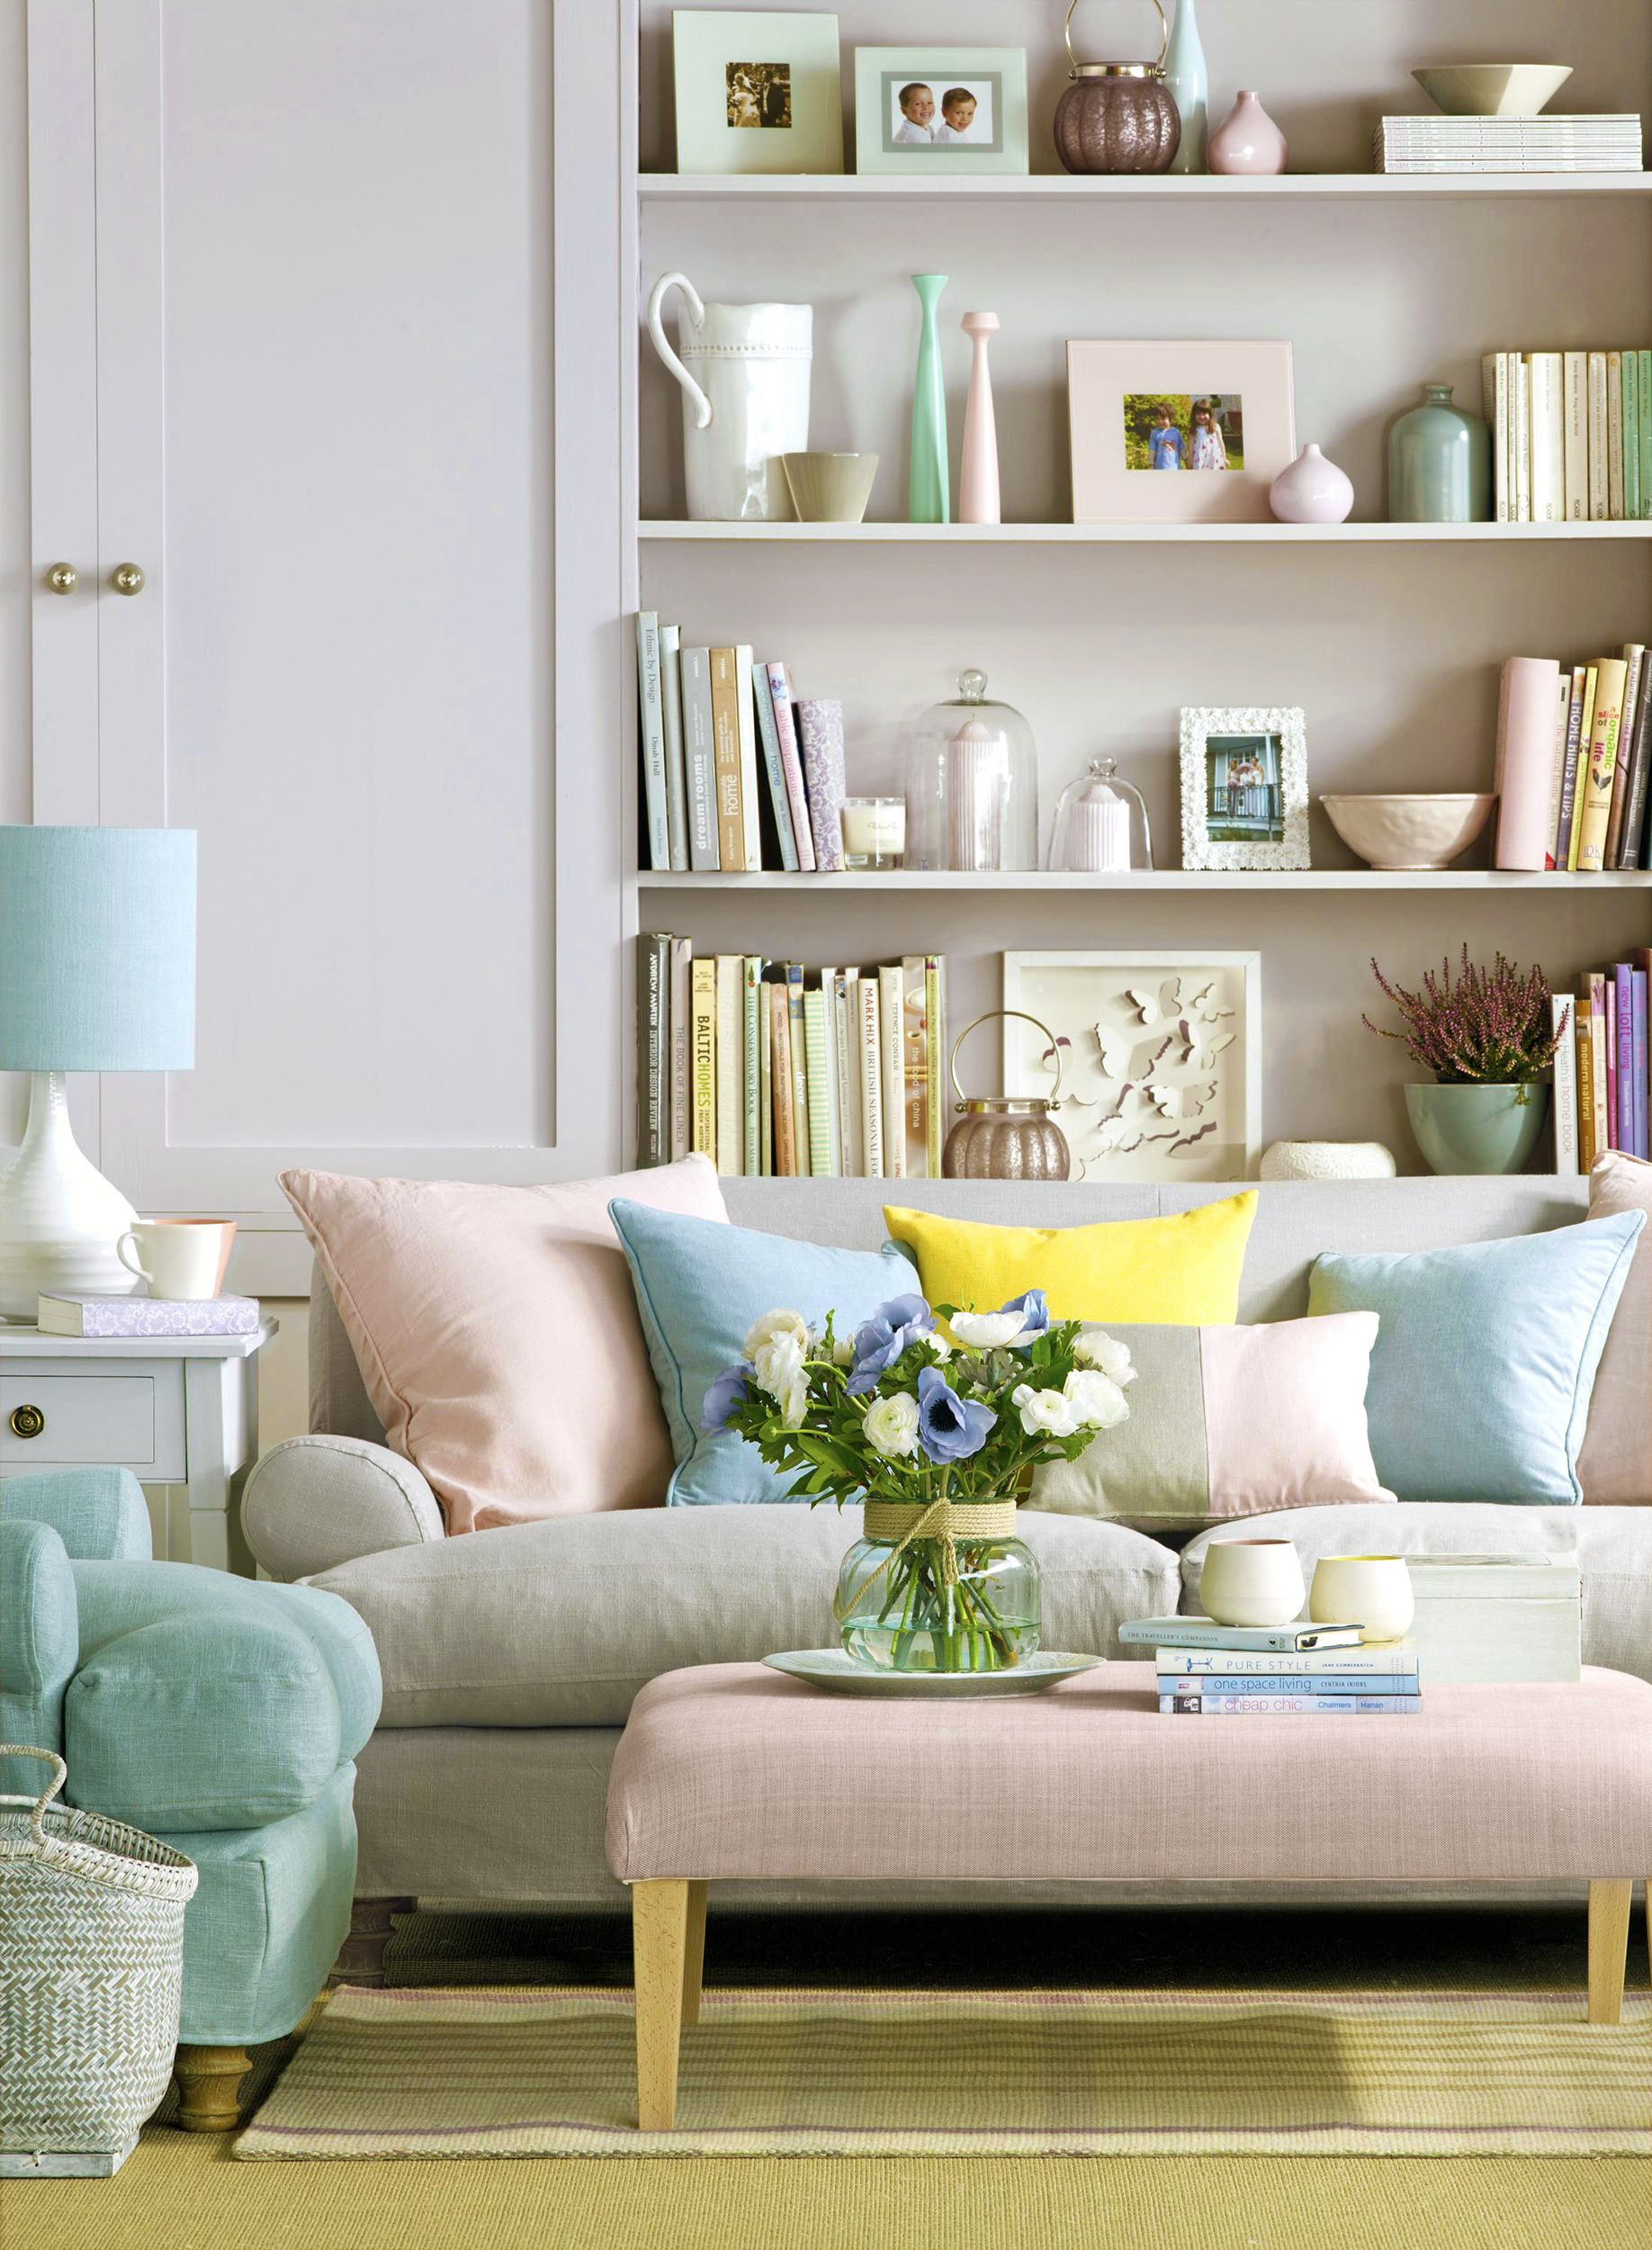 26 spring decor ideas to freshen up